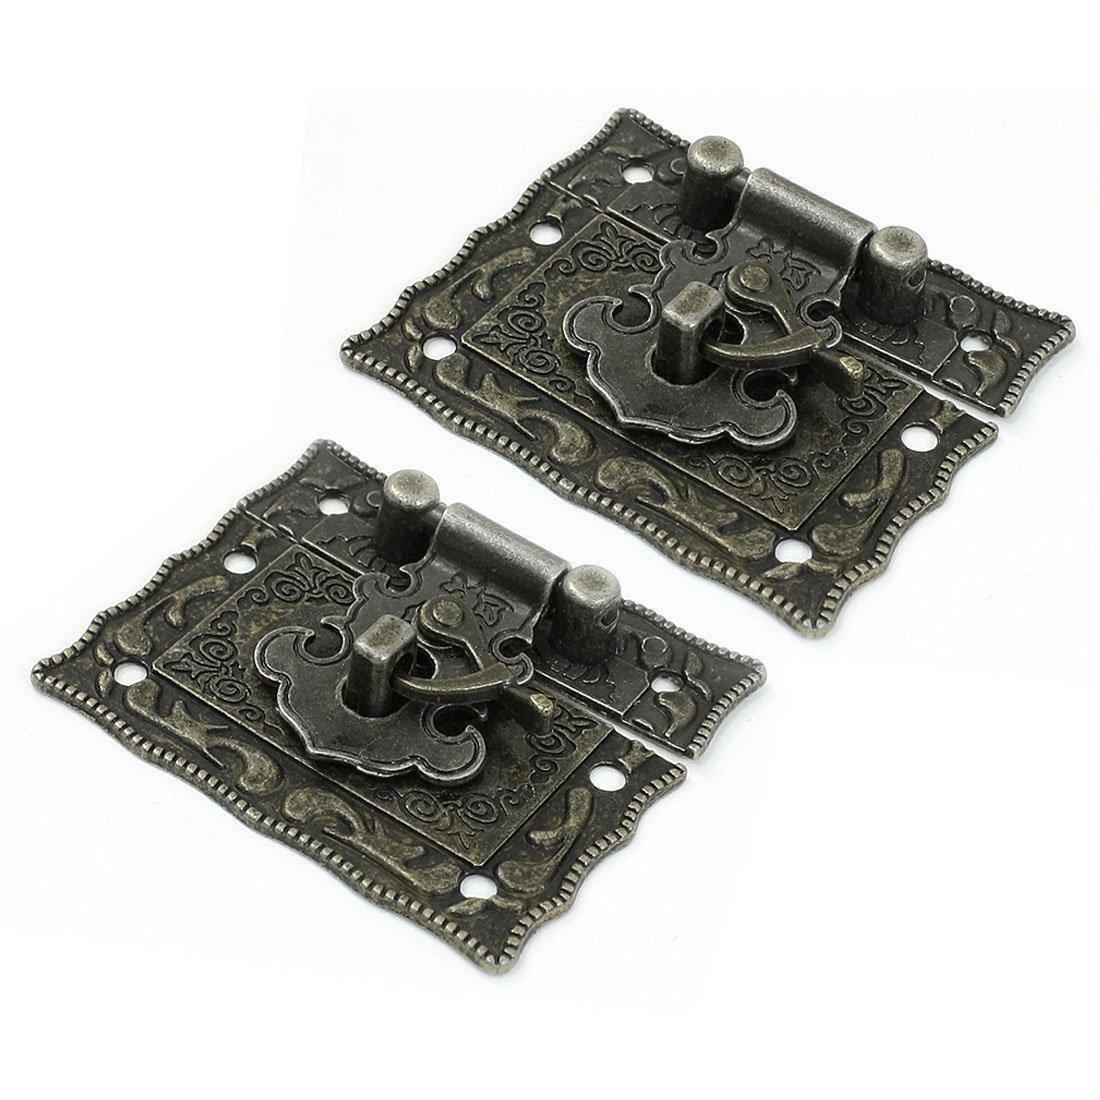 SODIAL(R) 2 Pcs Antique Style Hardware Bronze Tone Metal Rectangle Latch 42mm x 51mm